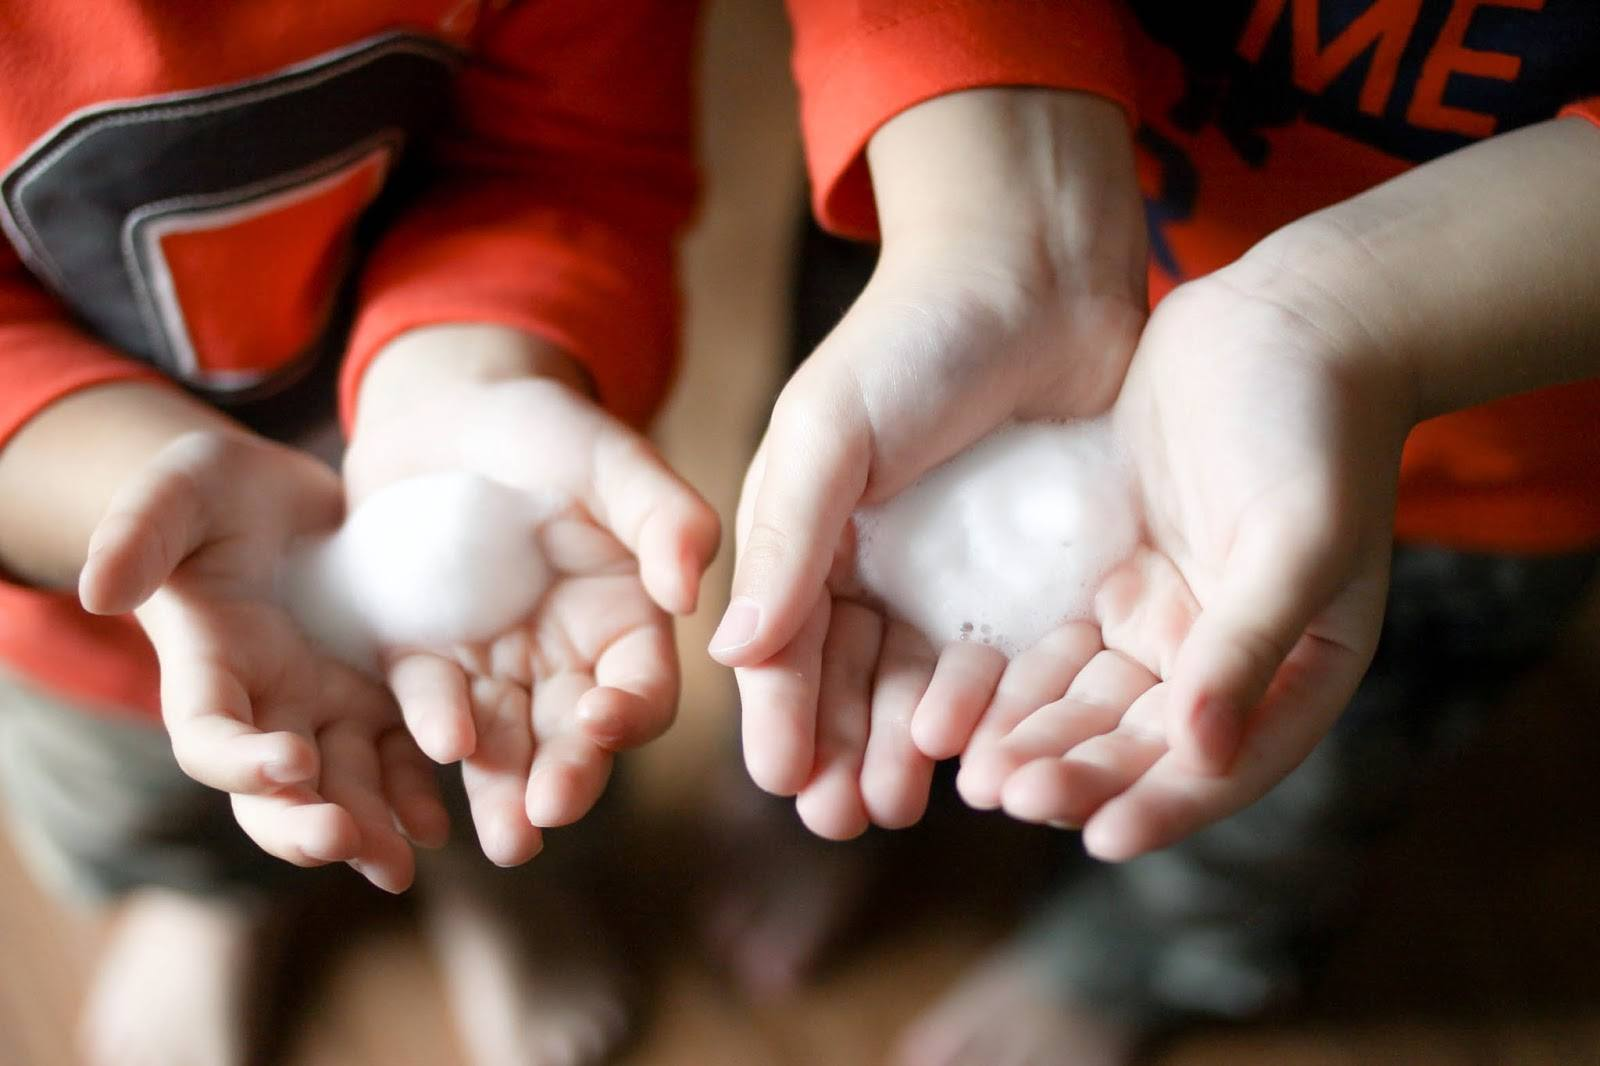 Germ Free Hands